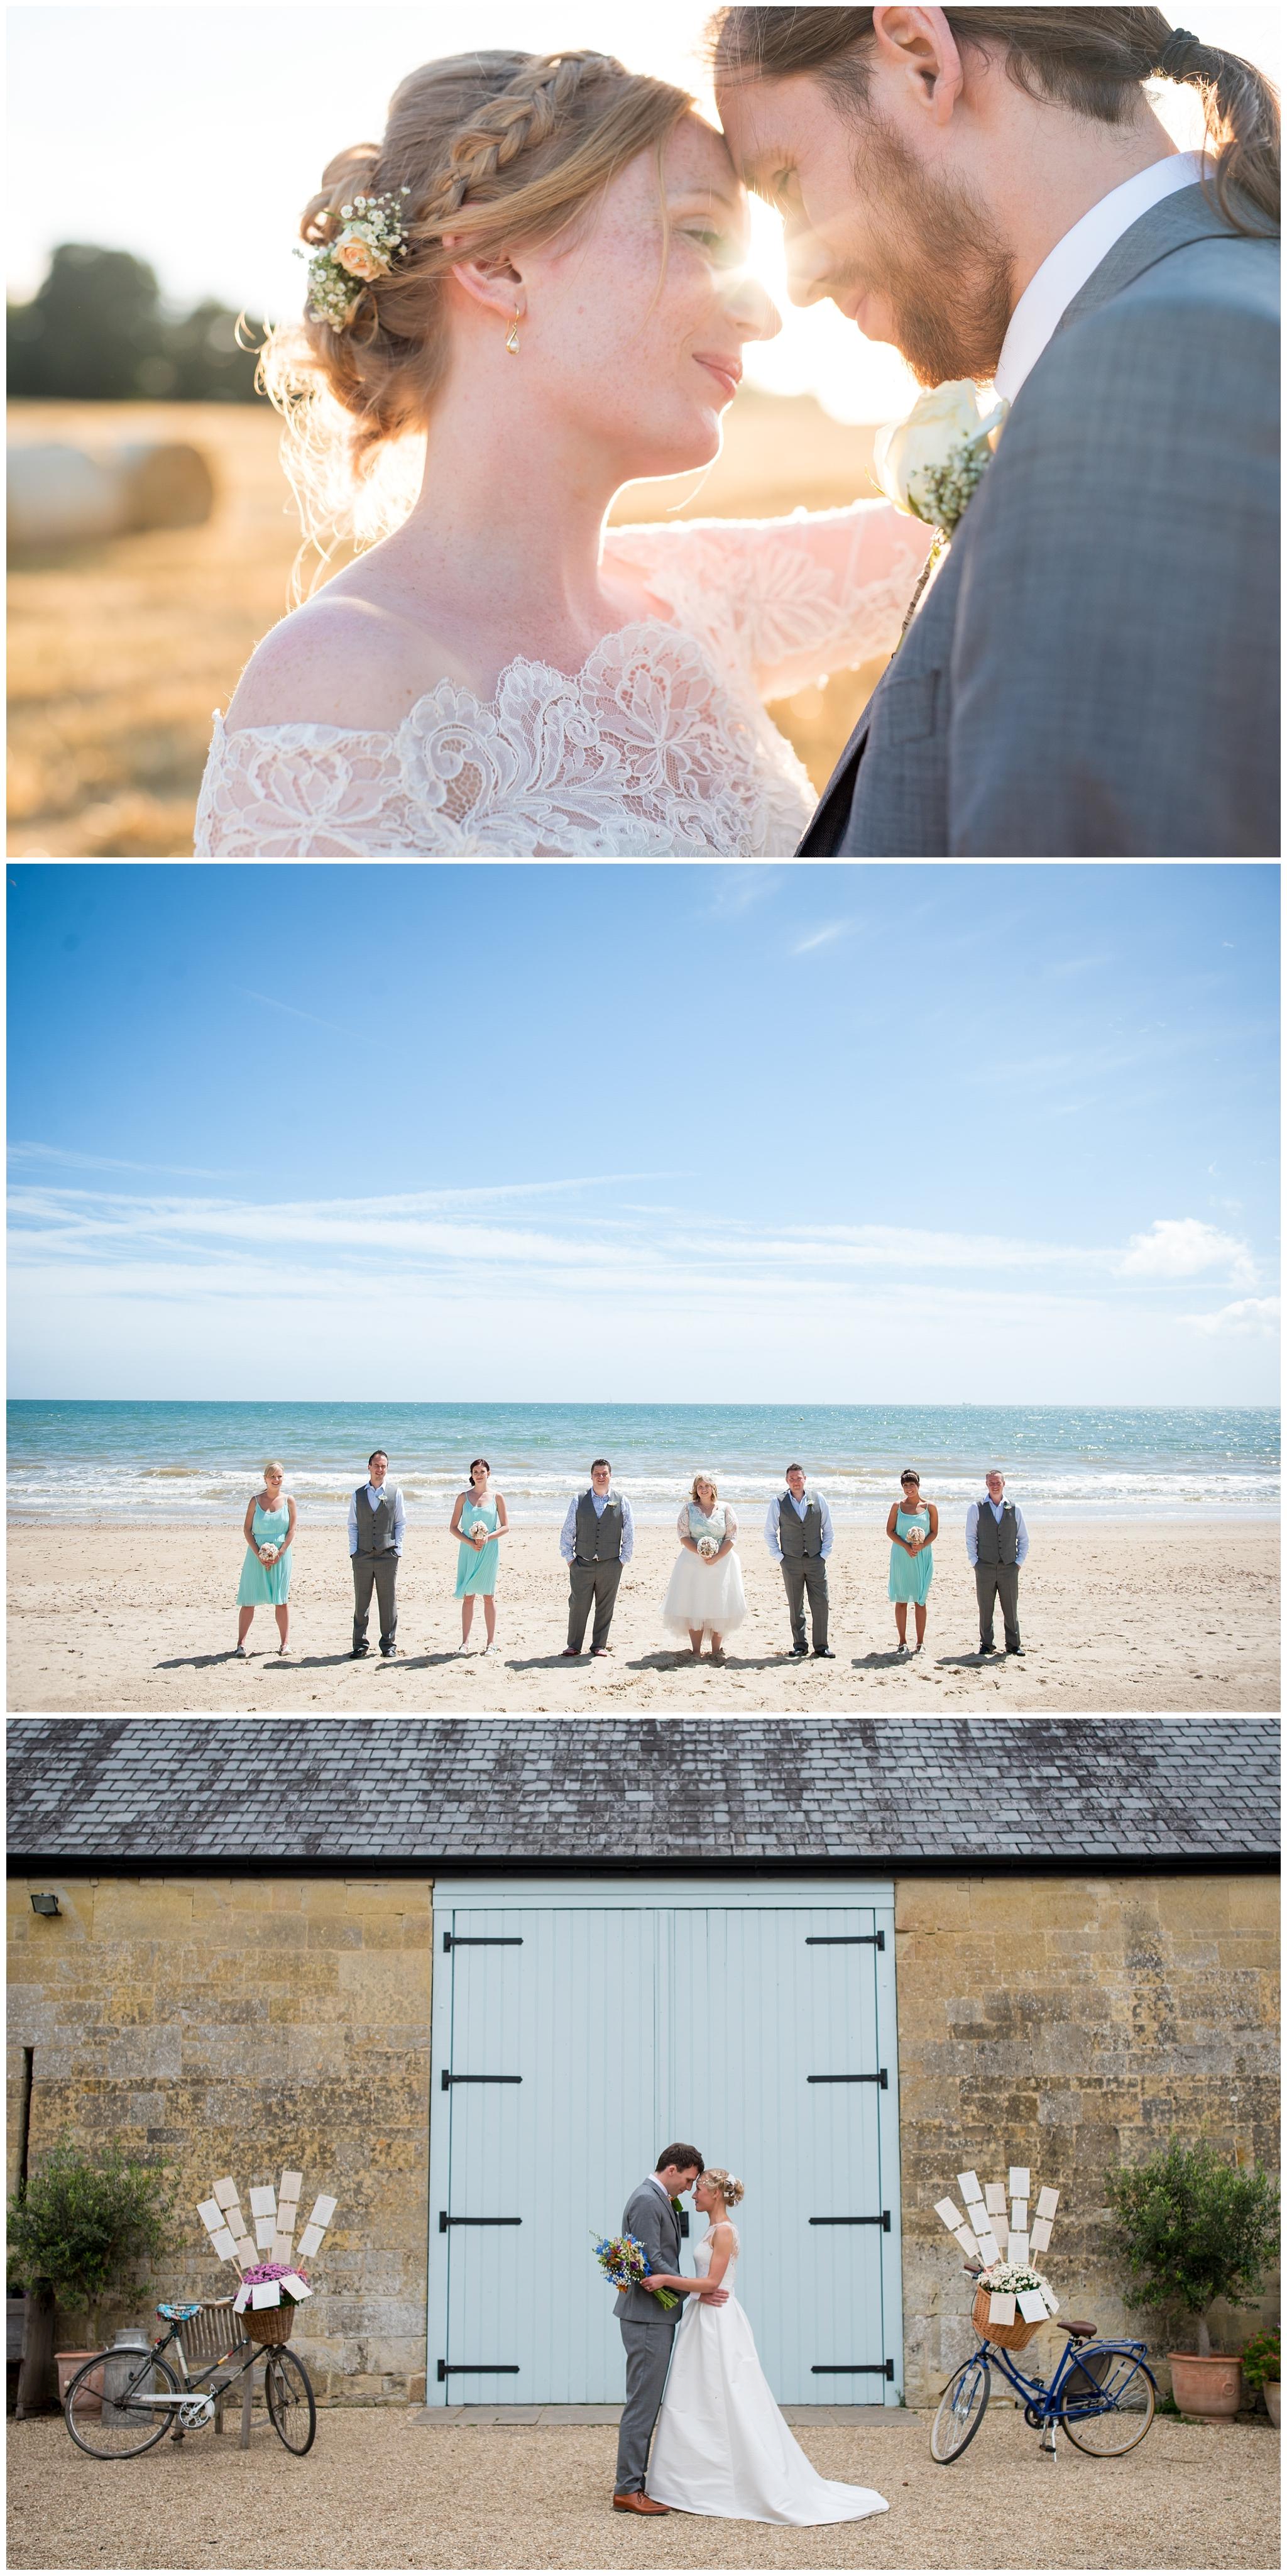 Contemporary wedding photography in Hmapshire